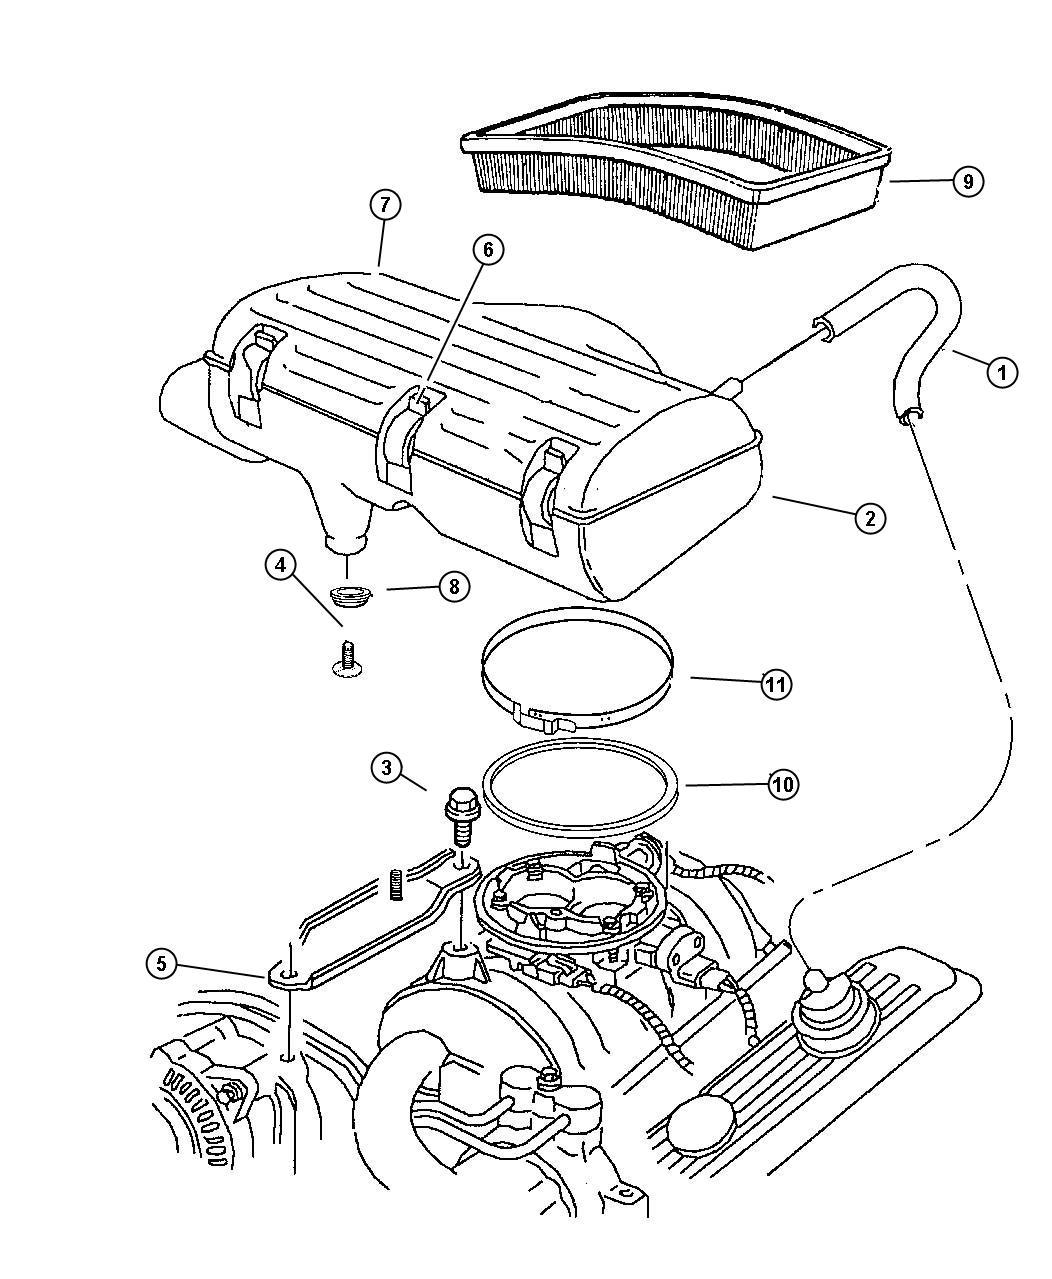 2001 Dodge Ram 1500 Body. Air cleaner. Lecold, nax, nab